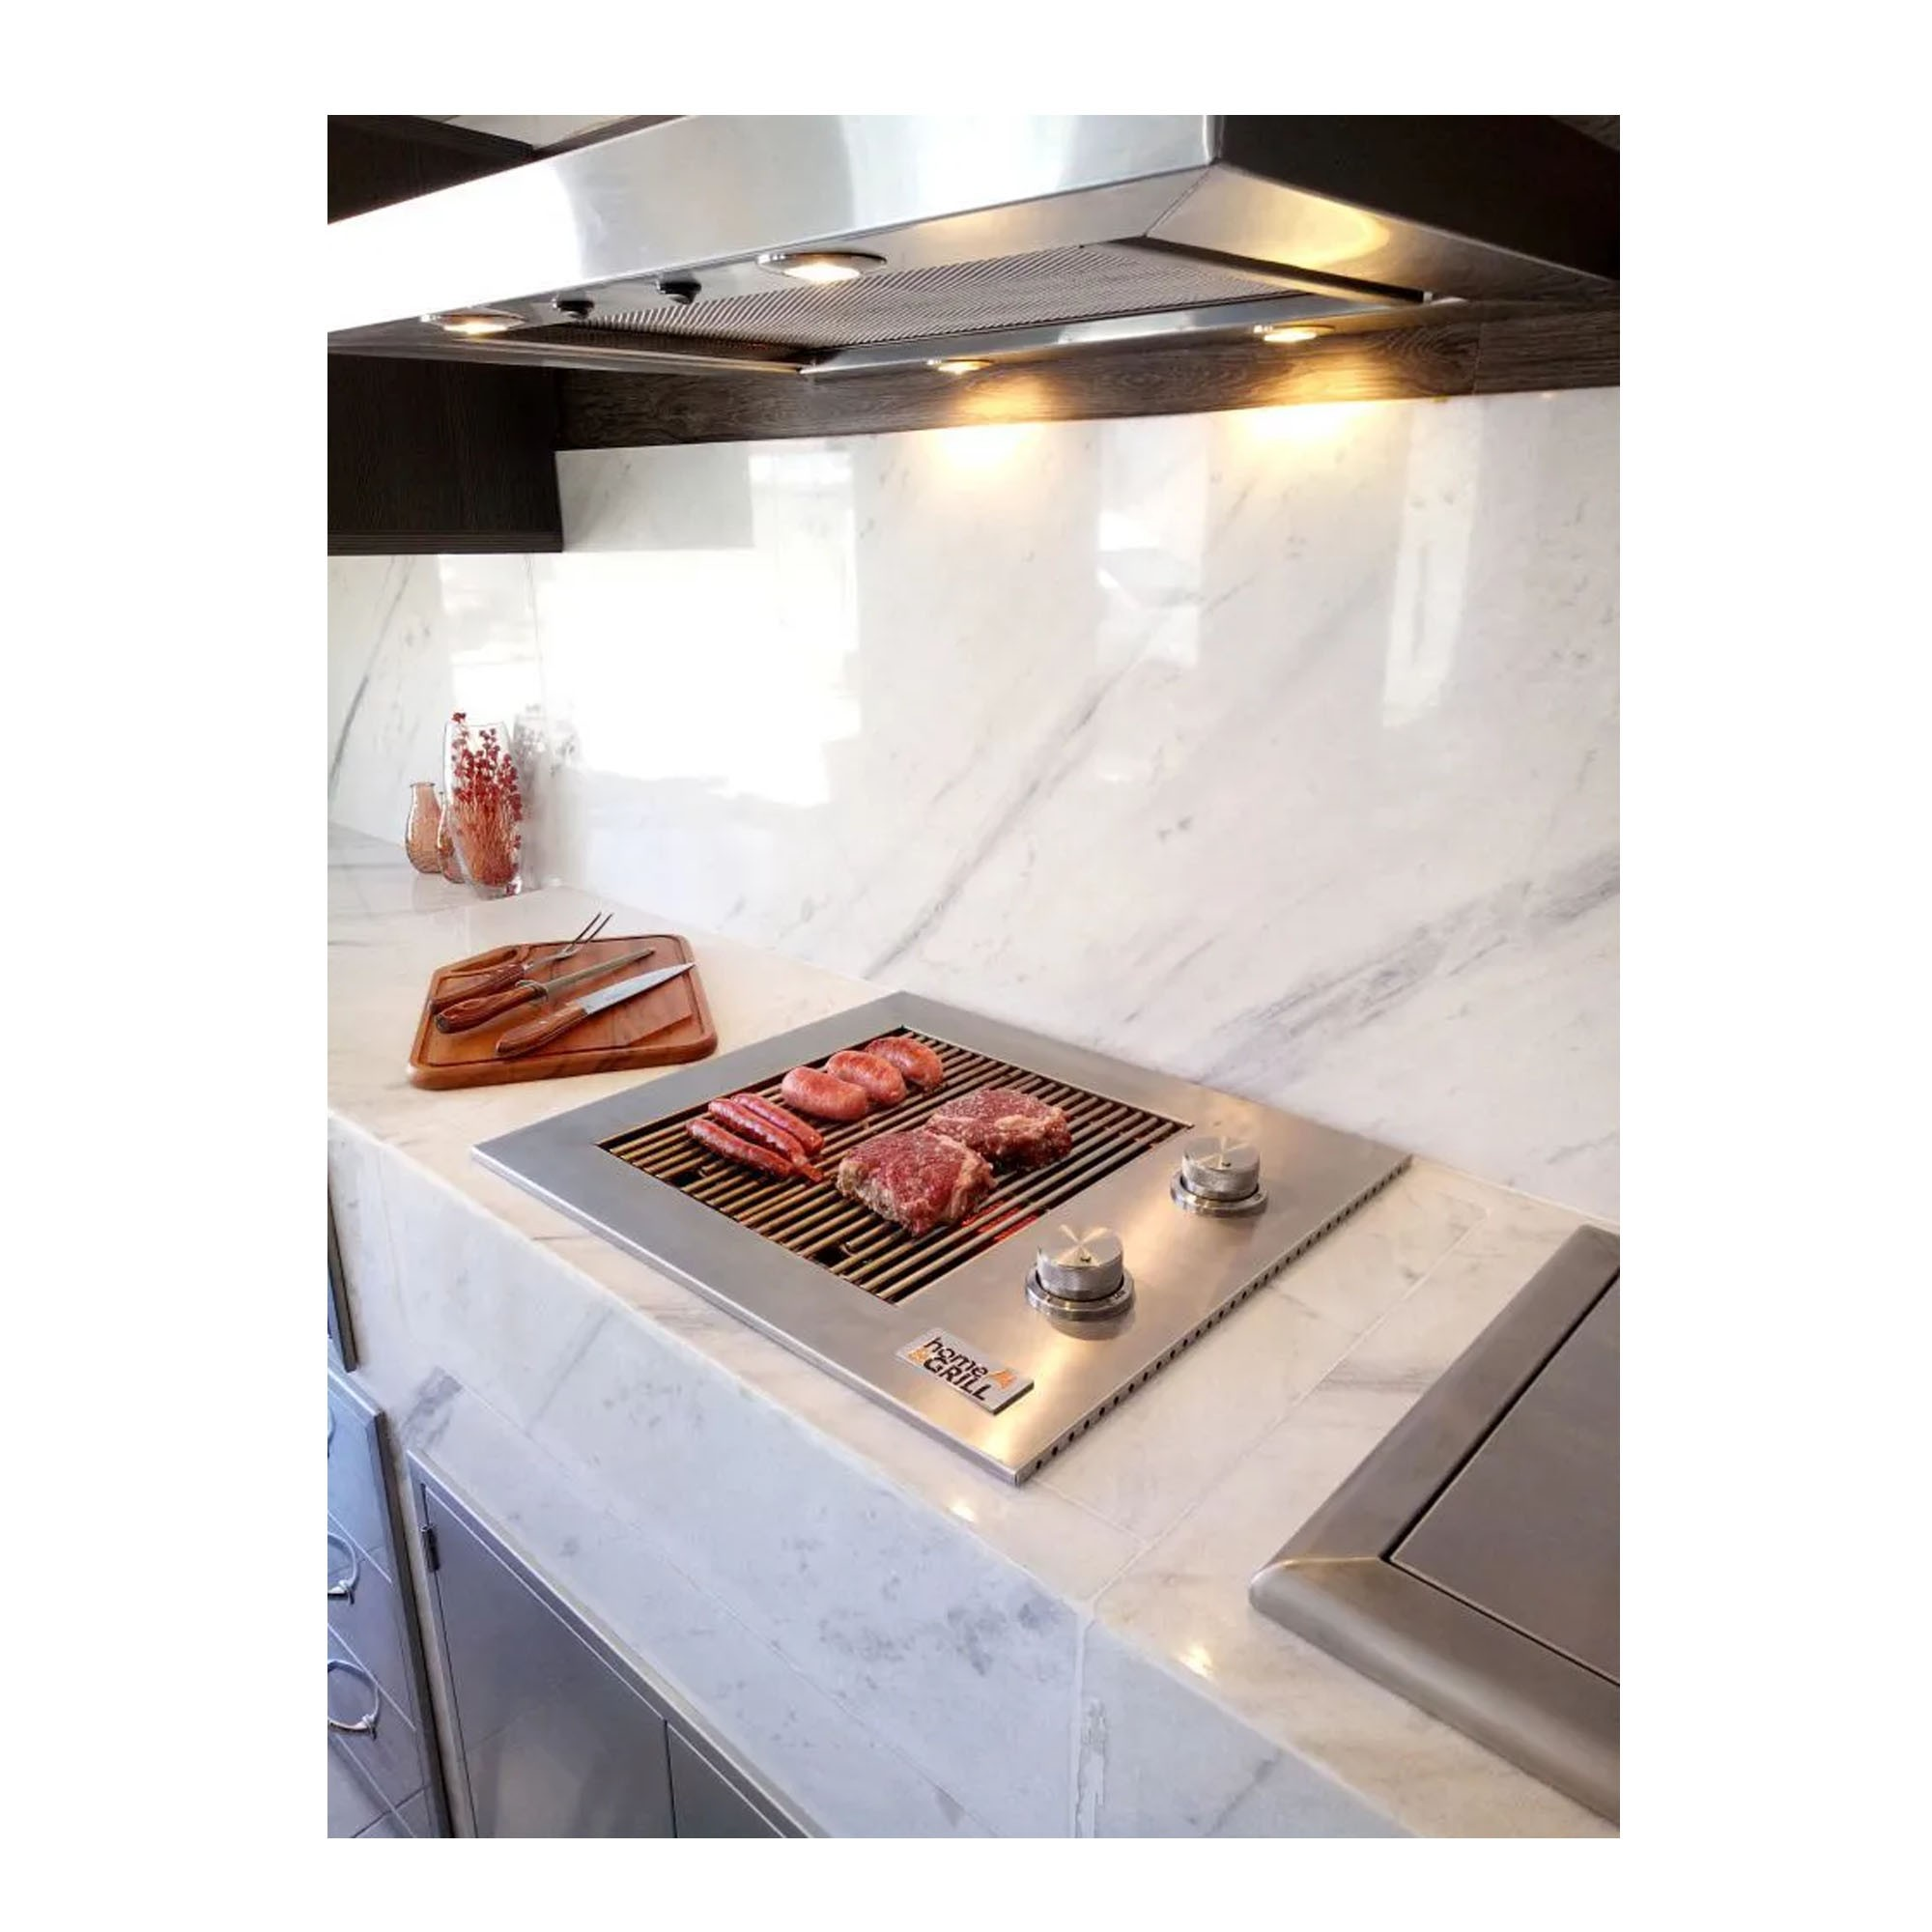 Churrasqueira a Gás Home&Grill Drop-In HG-2B Sem Tampa - Inox 304  - Sua Casa Gourmet e Cia